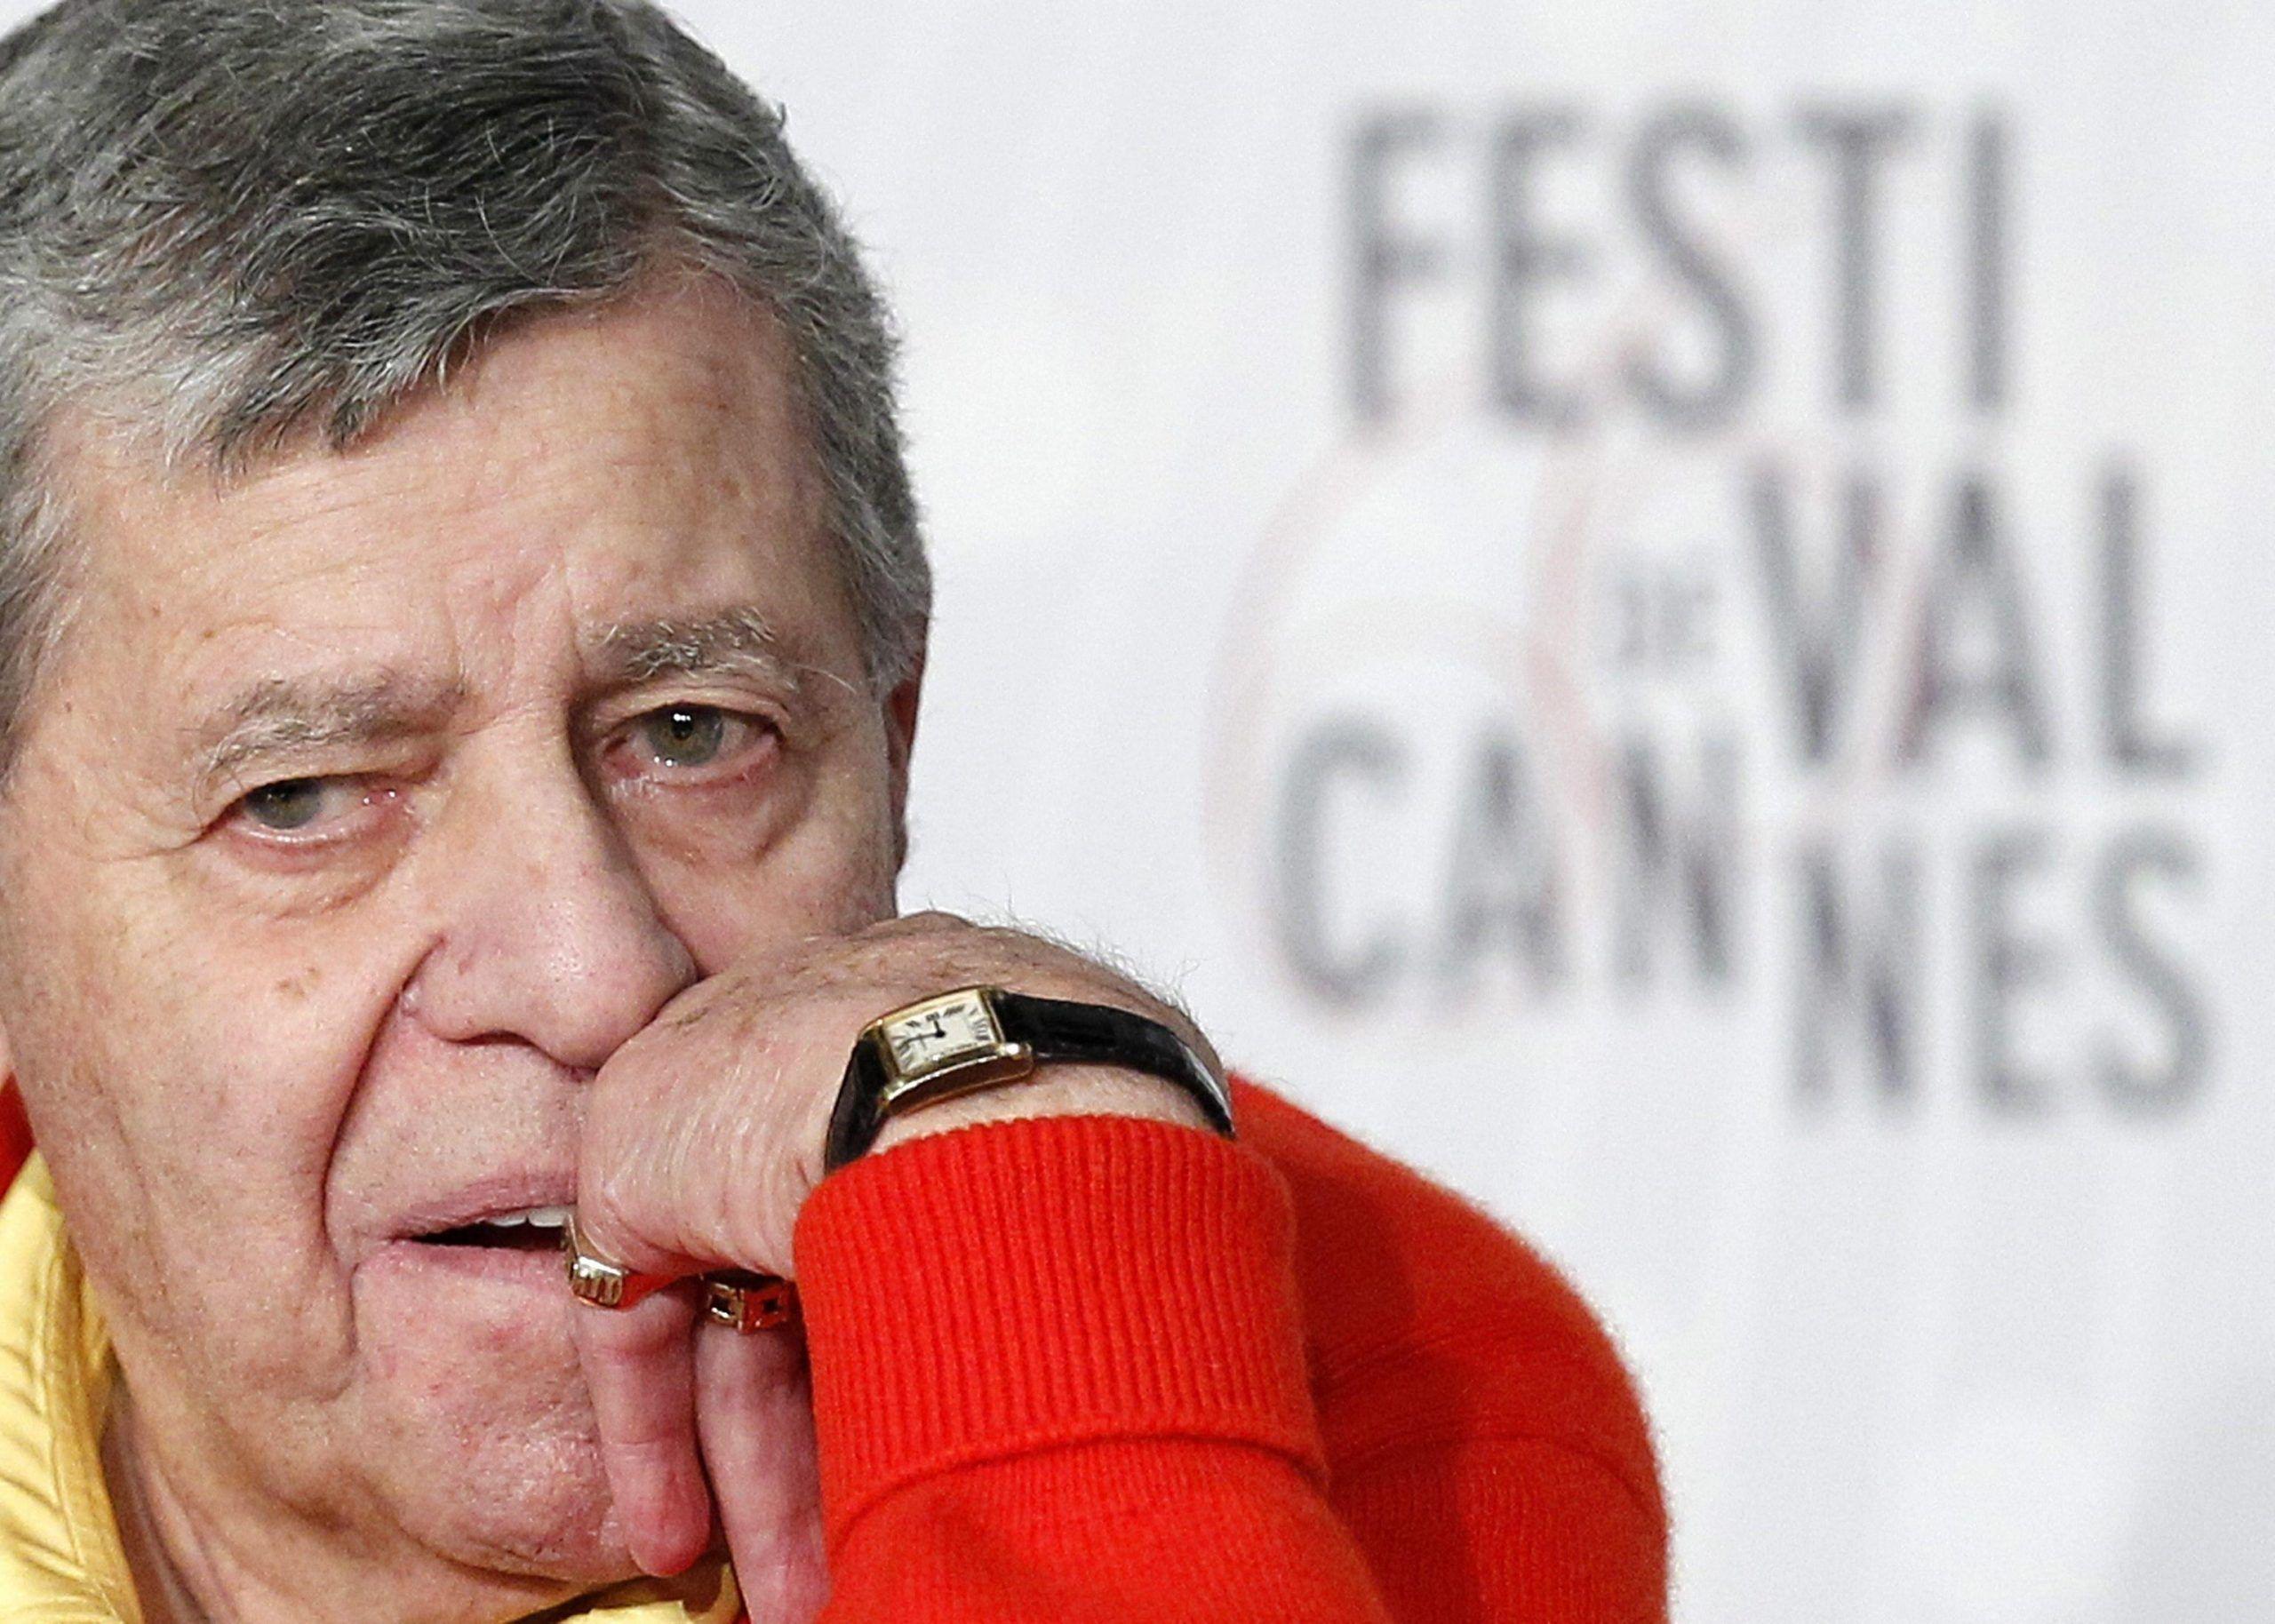 ++ Cinema: media, e' morto Jerry Lewis, aveva 91 anni ++